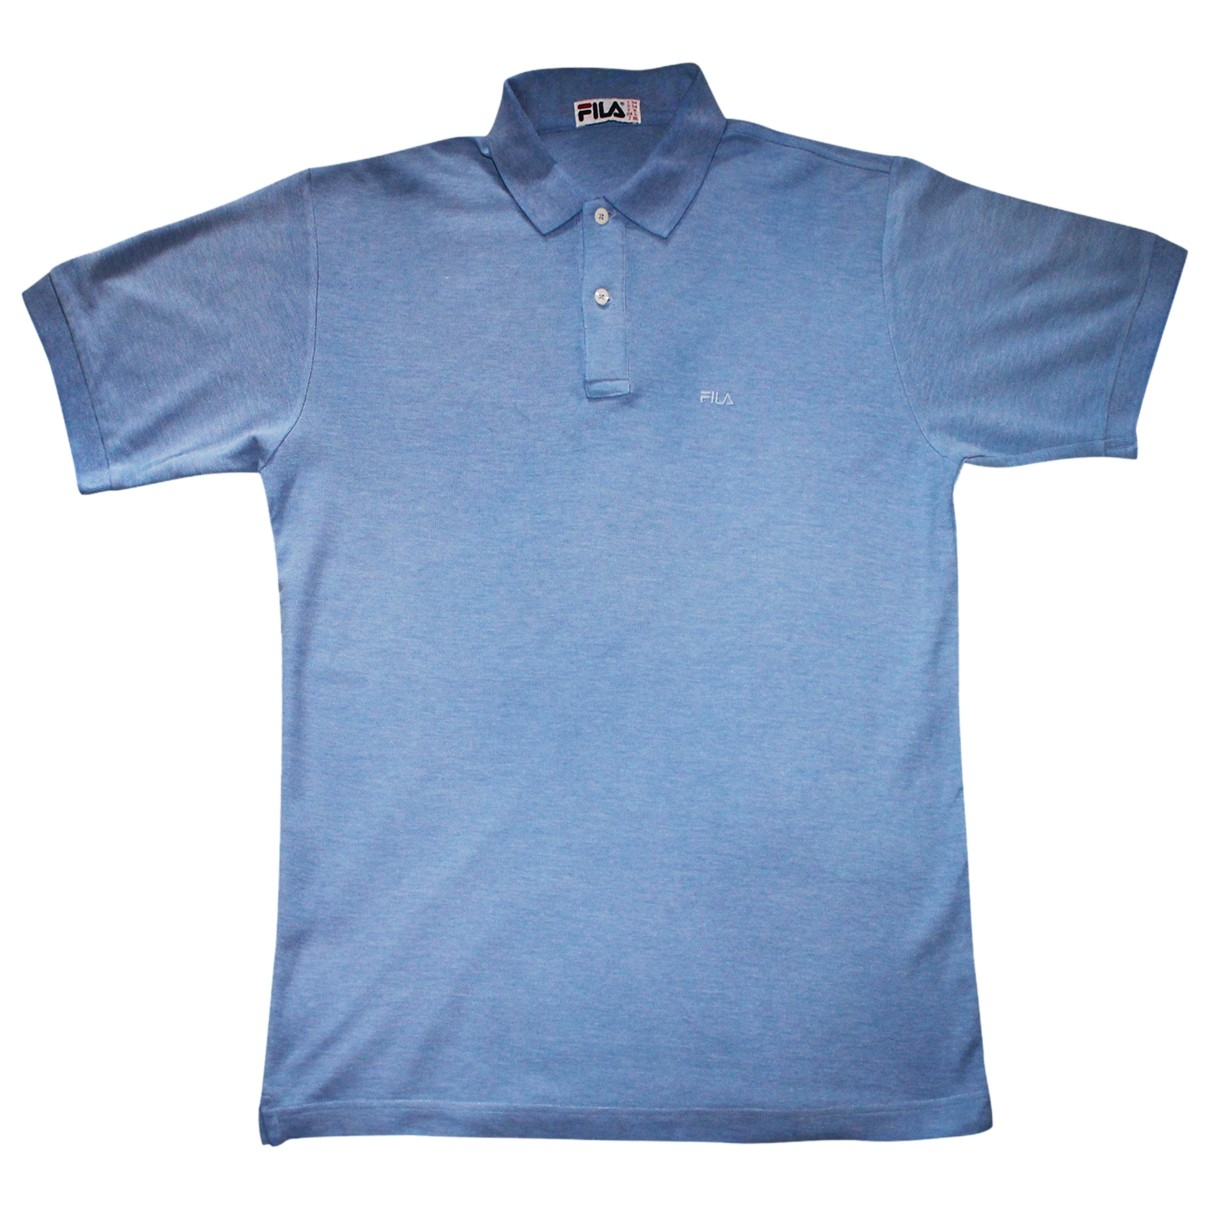 Fila \N Navy Cotton Polo shirts for Men 54 IT